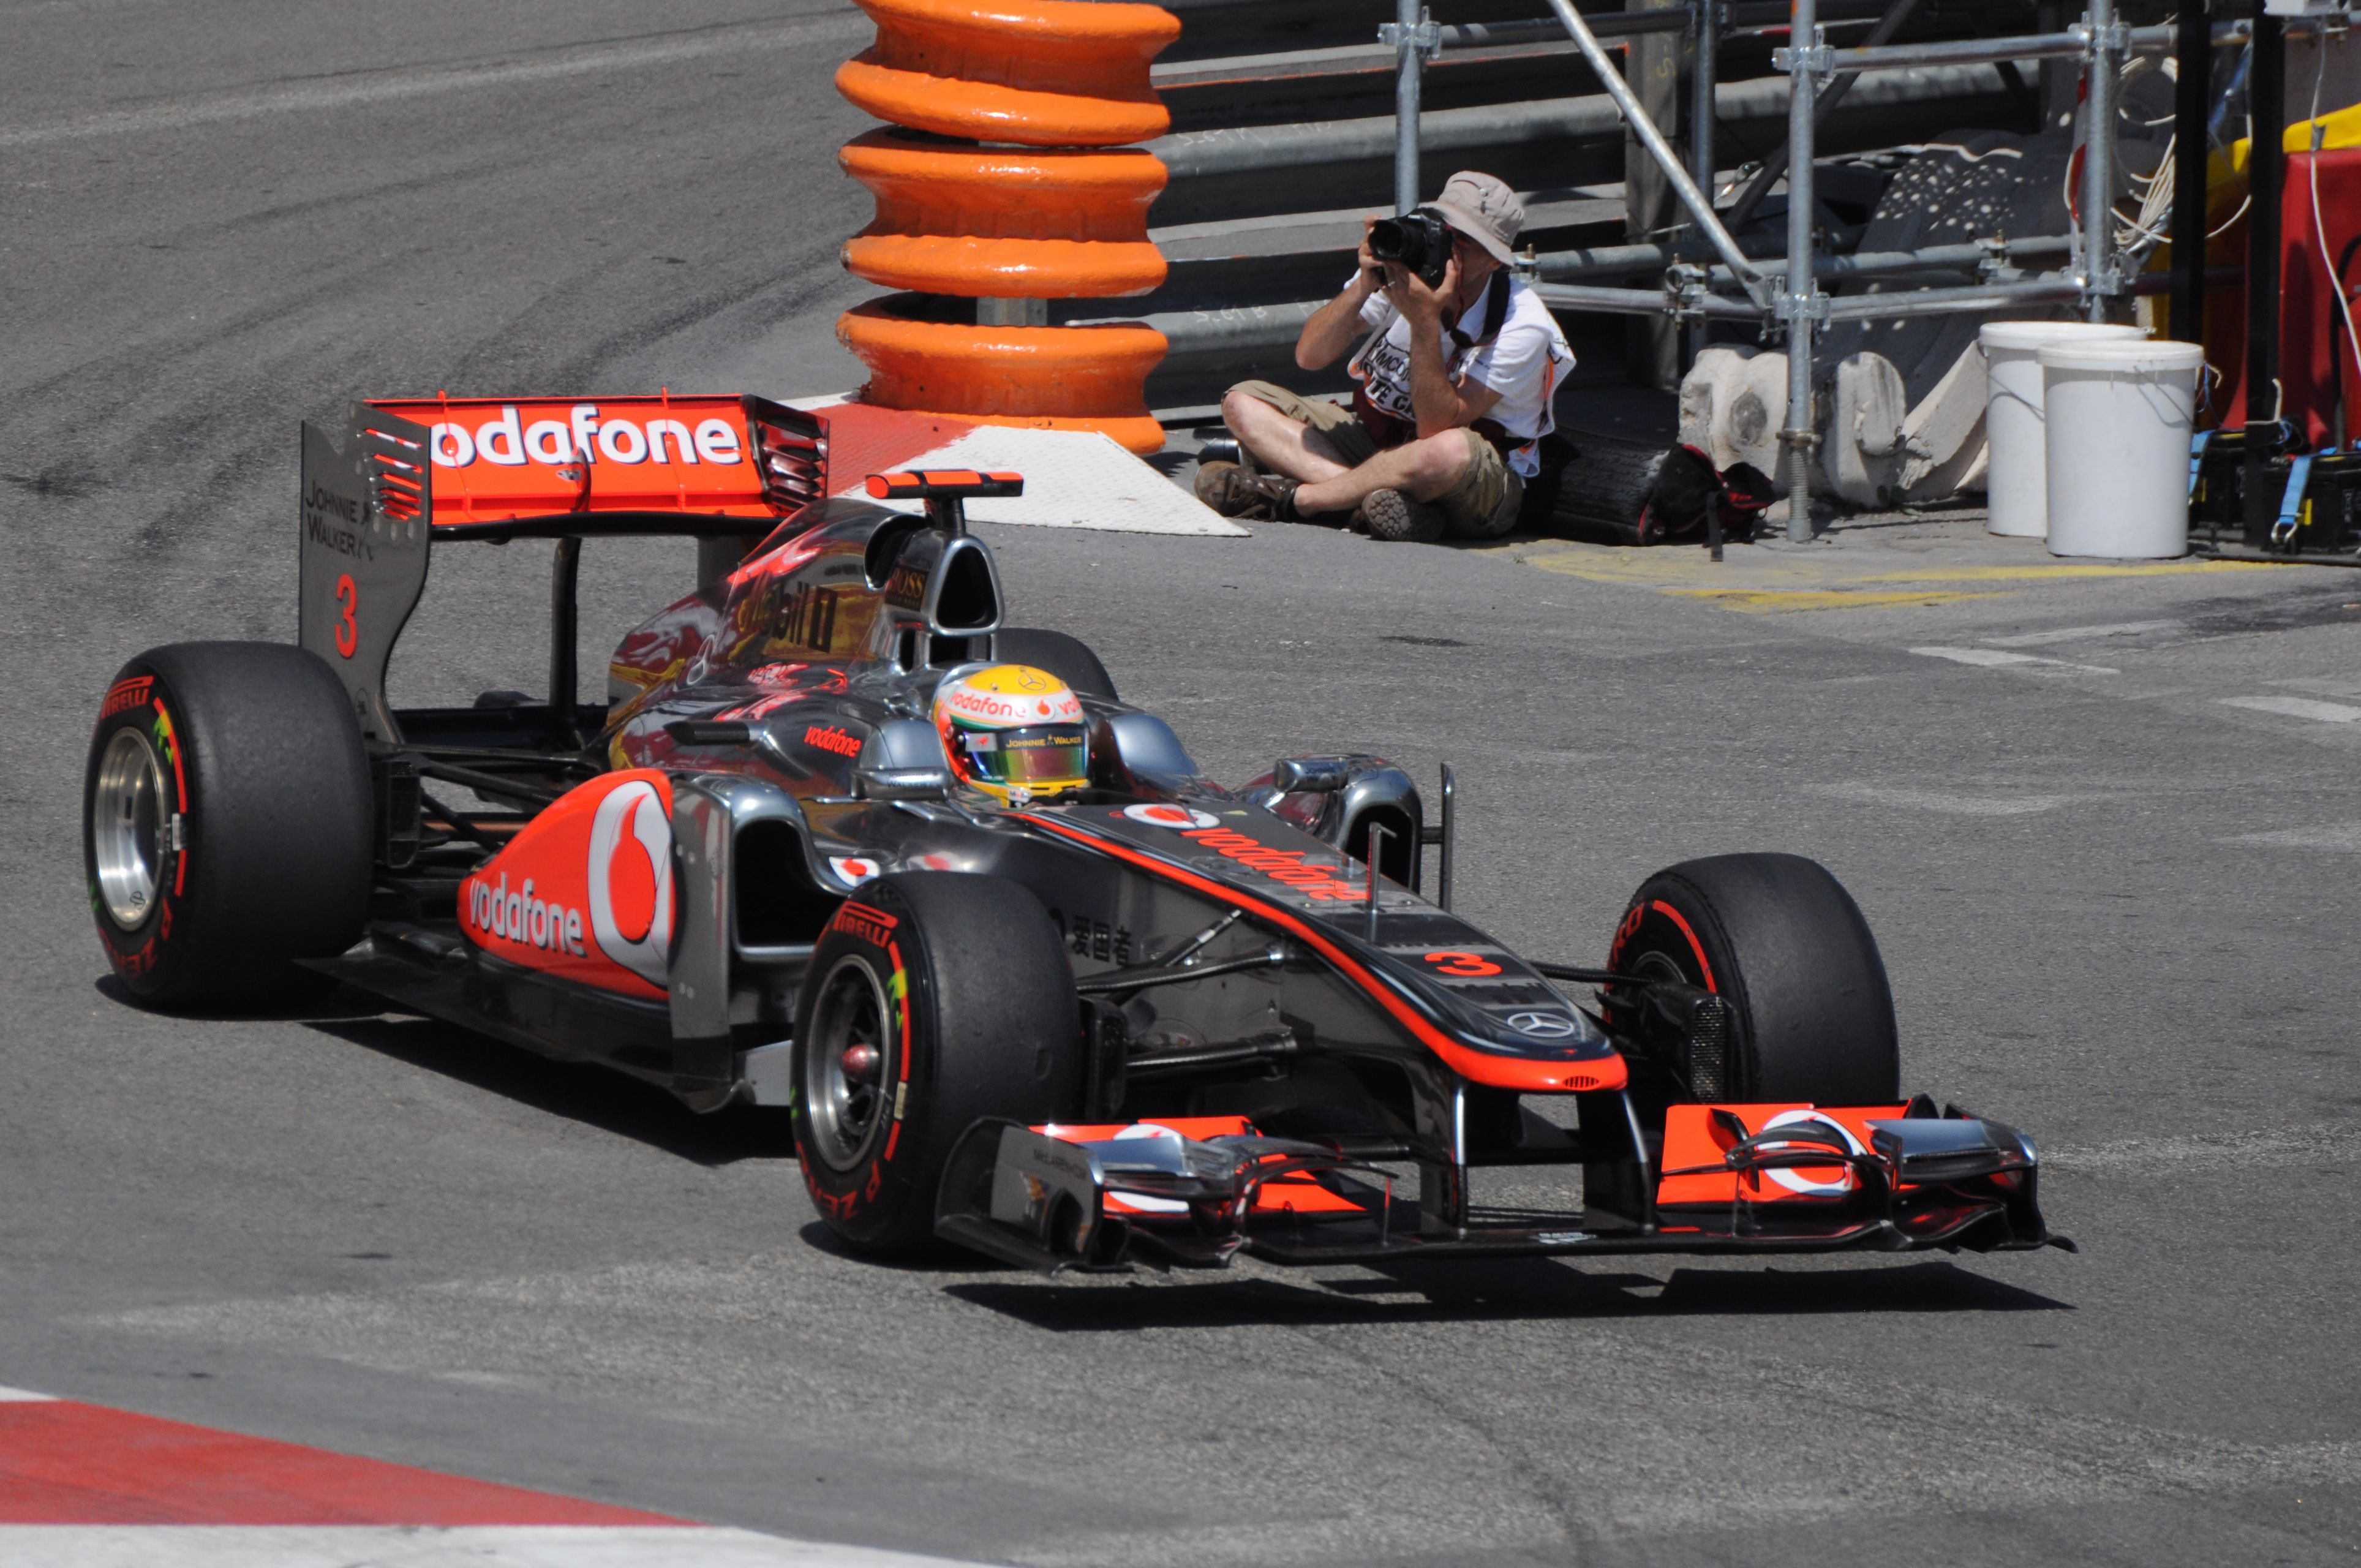 P5 Lewis Hamilton Eng Mclaren Mercedes Mp4 26 227 Points Motorsport Racing F1 Formel1 Formula1 Formulaone Motor Sport Passio Formule 1 Formule E